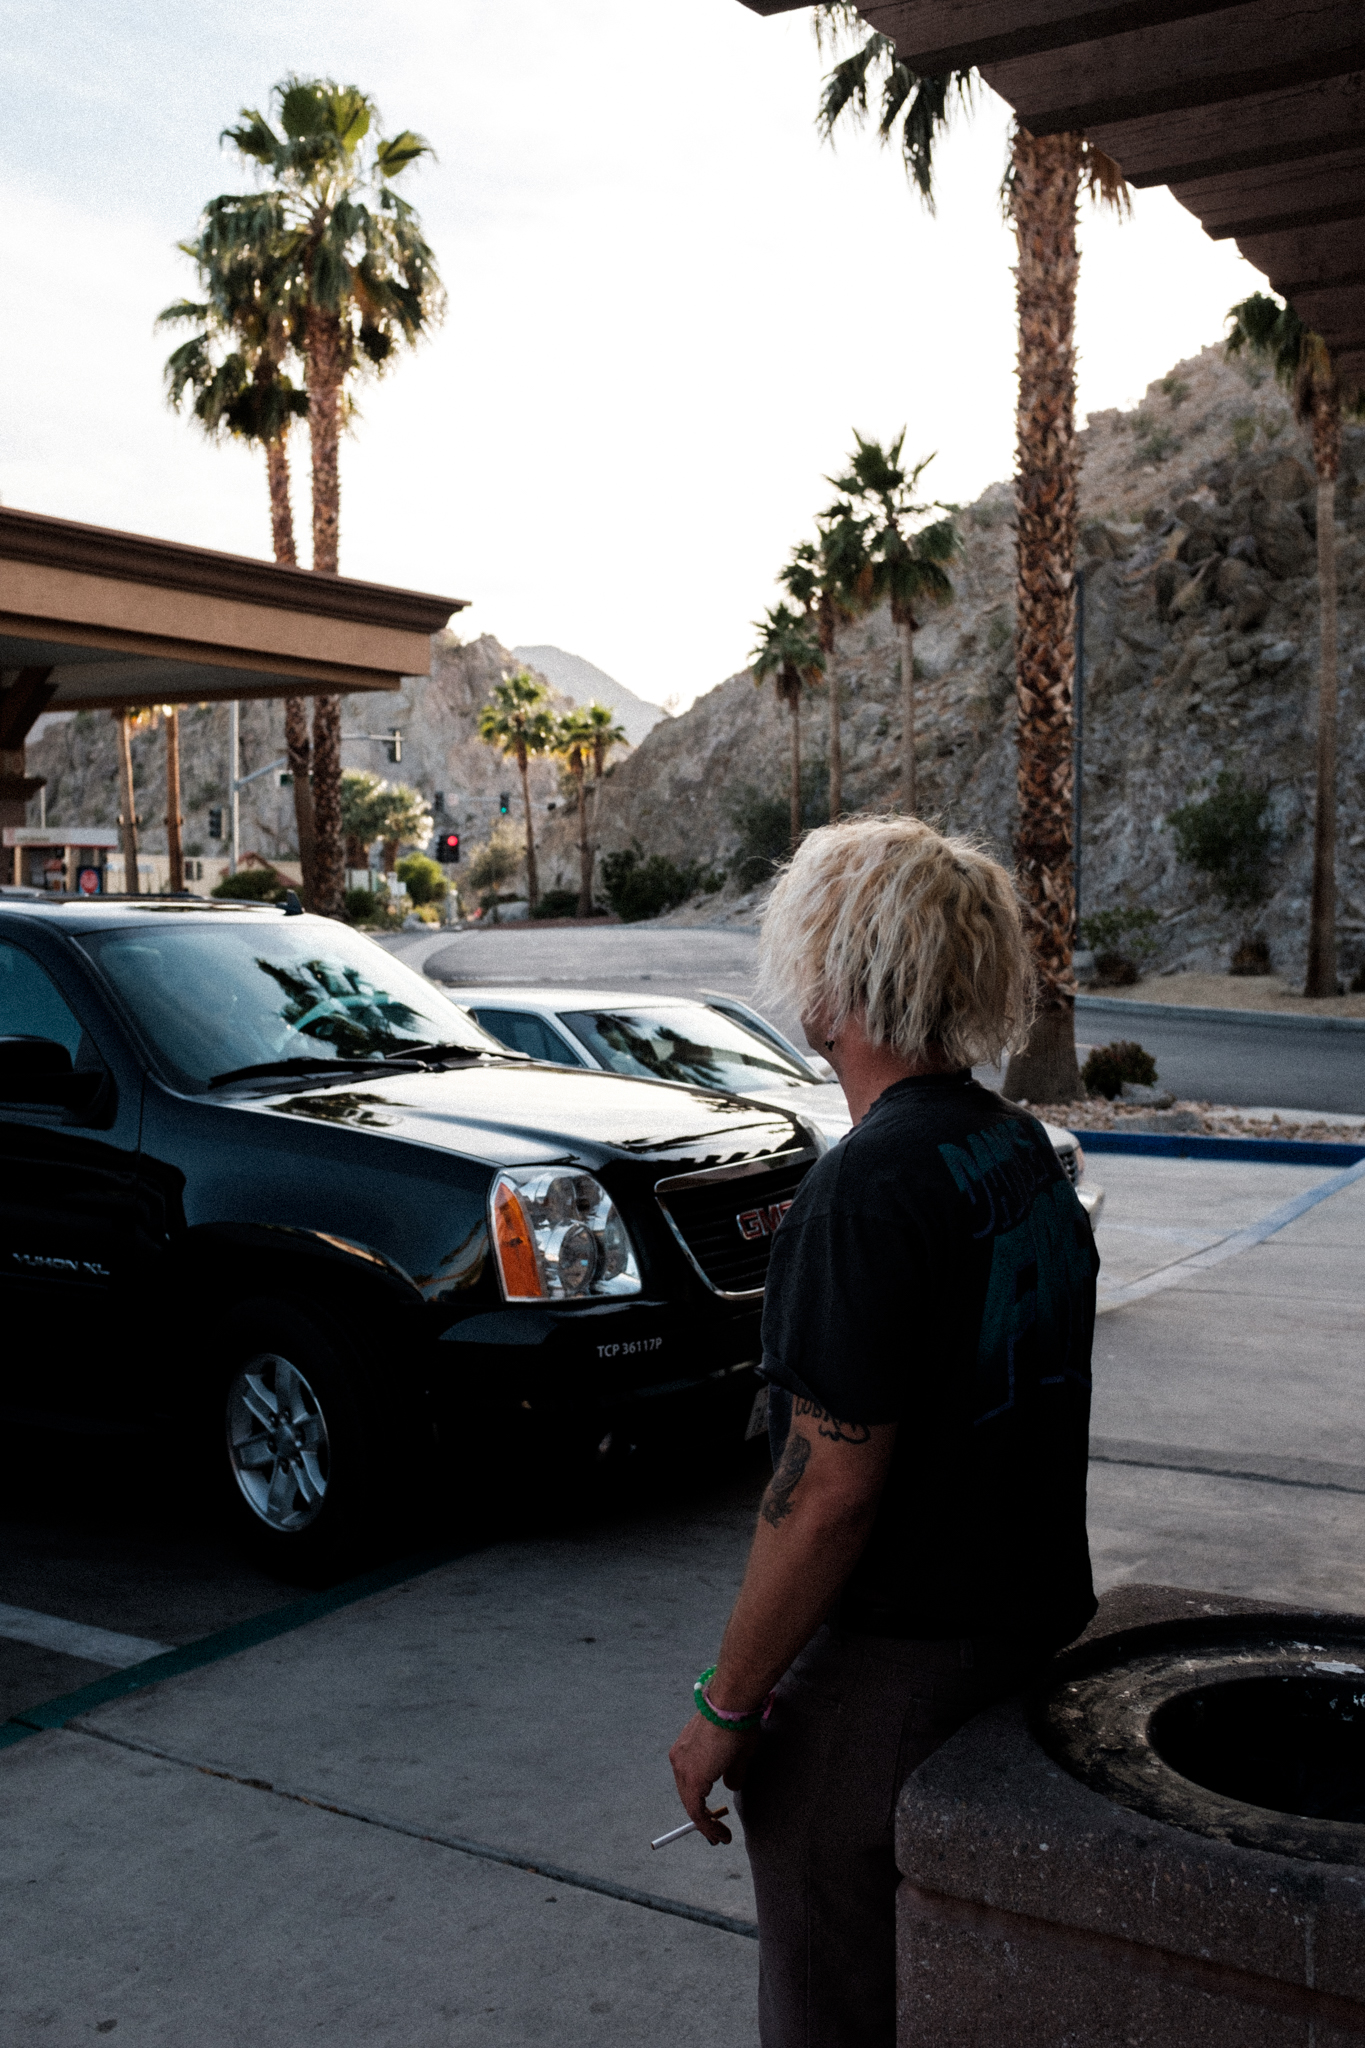 170416 Coachella 17 w1 1248.jpg